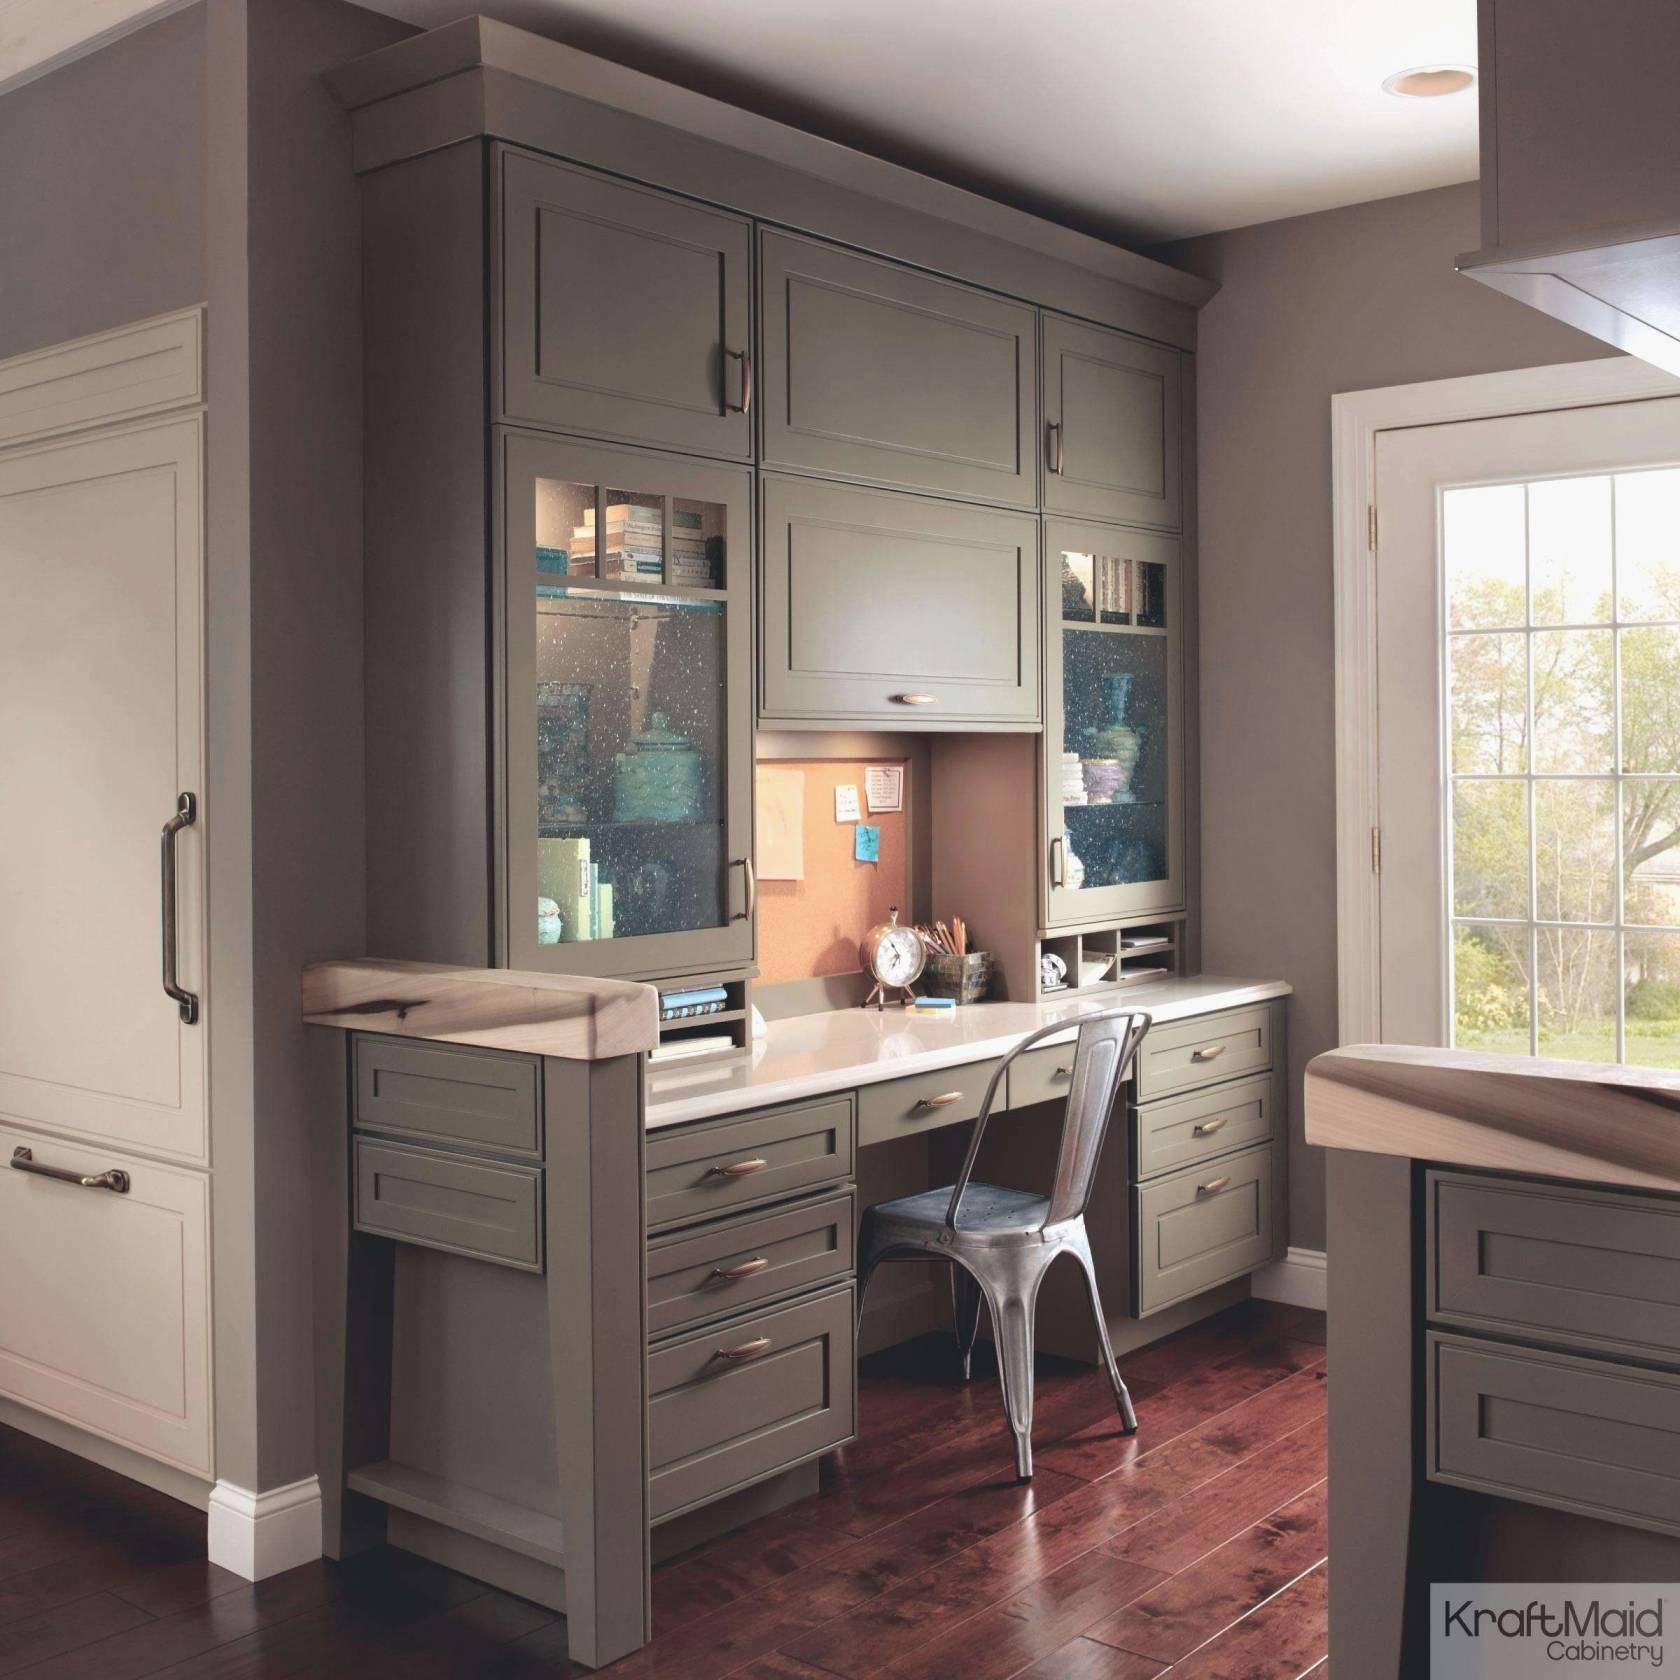 hardwood flooring toronto ontario of elegant kitchen cabinets on sale toronto www princesofkingsroad in cabinets on sale toronto 2018